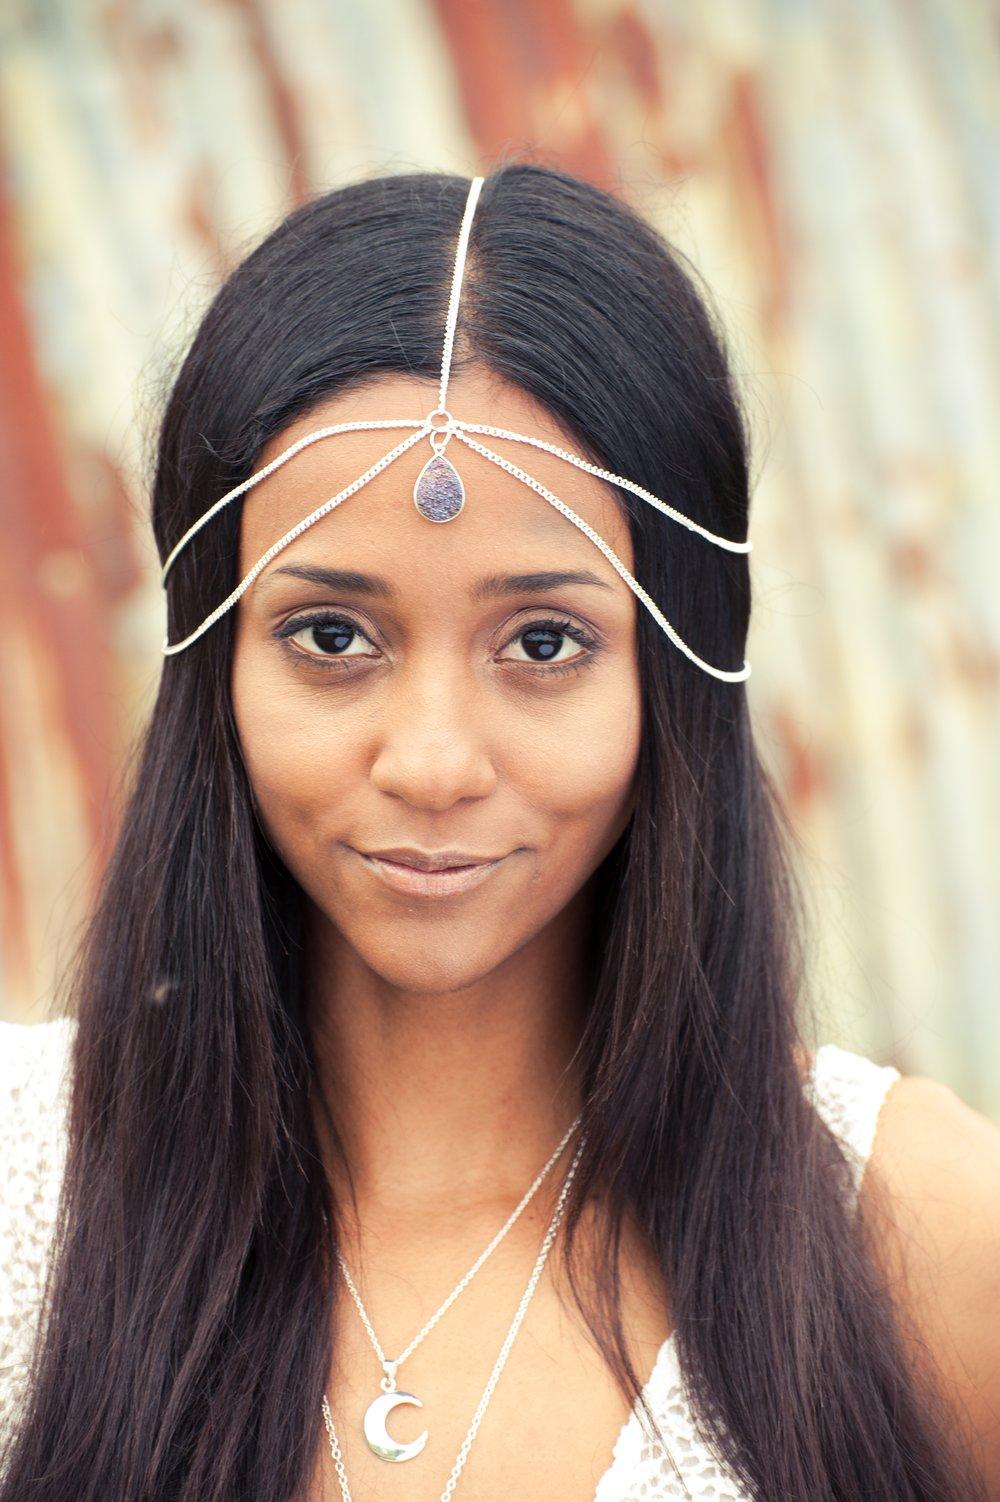 Image of Bali Head Chain Silver